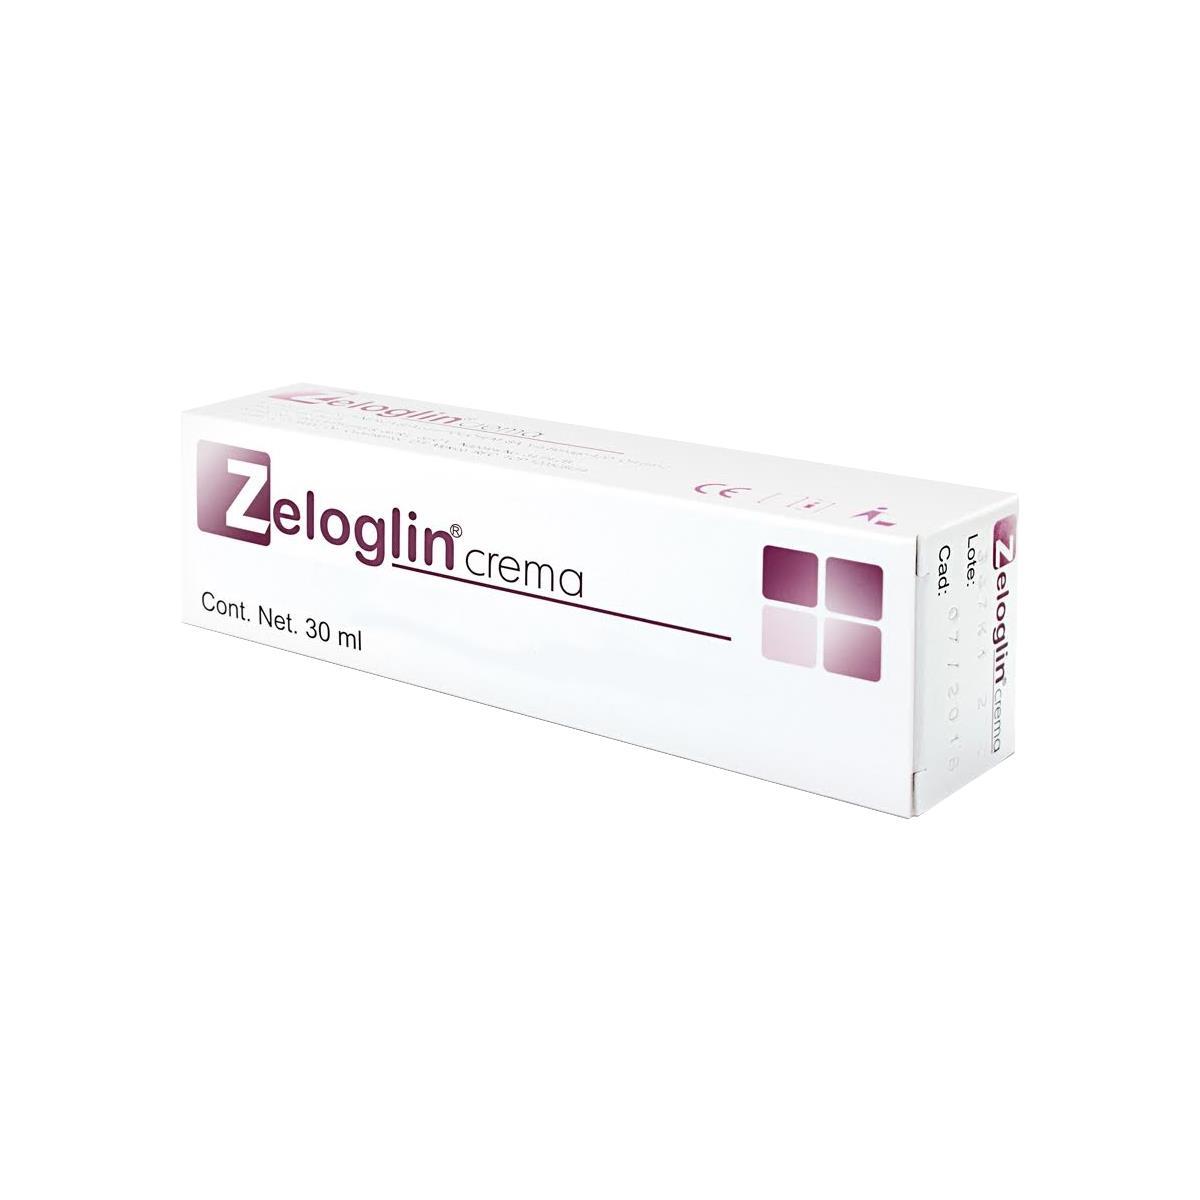 Zeloglin Crema 30 Ml